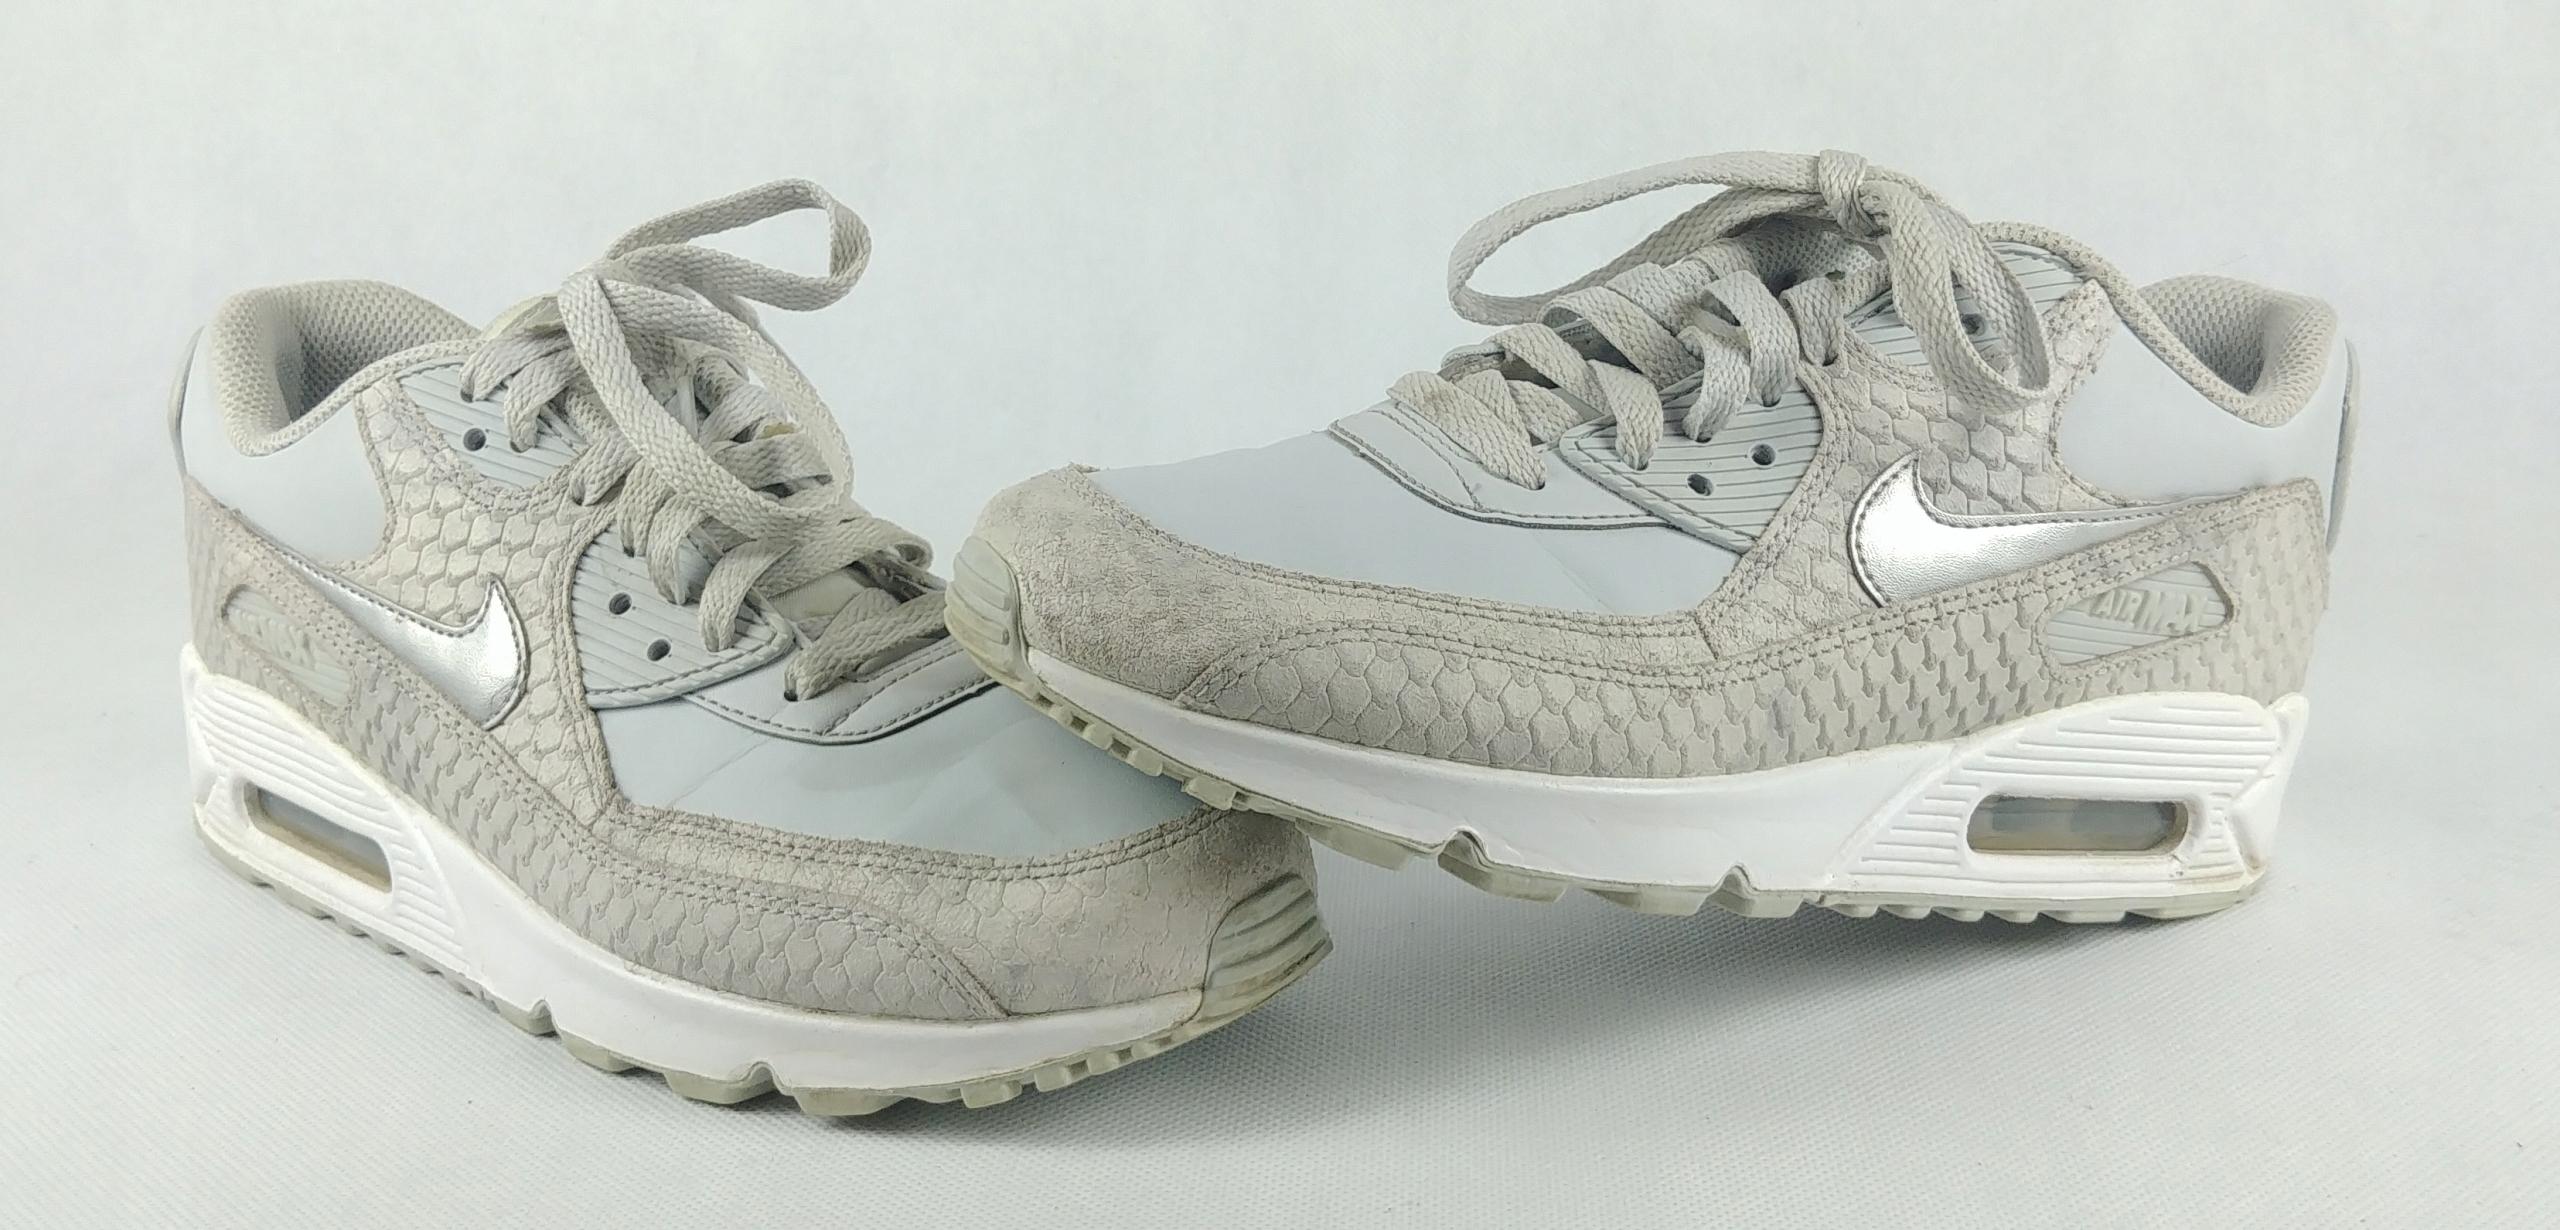 NIKE AIR MAX 90 buty sportowe damskie r. 38,5